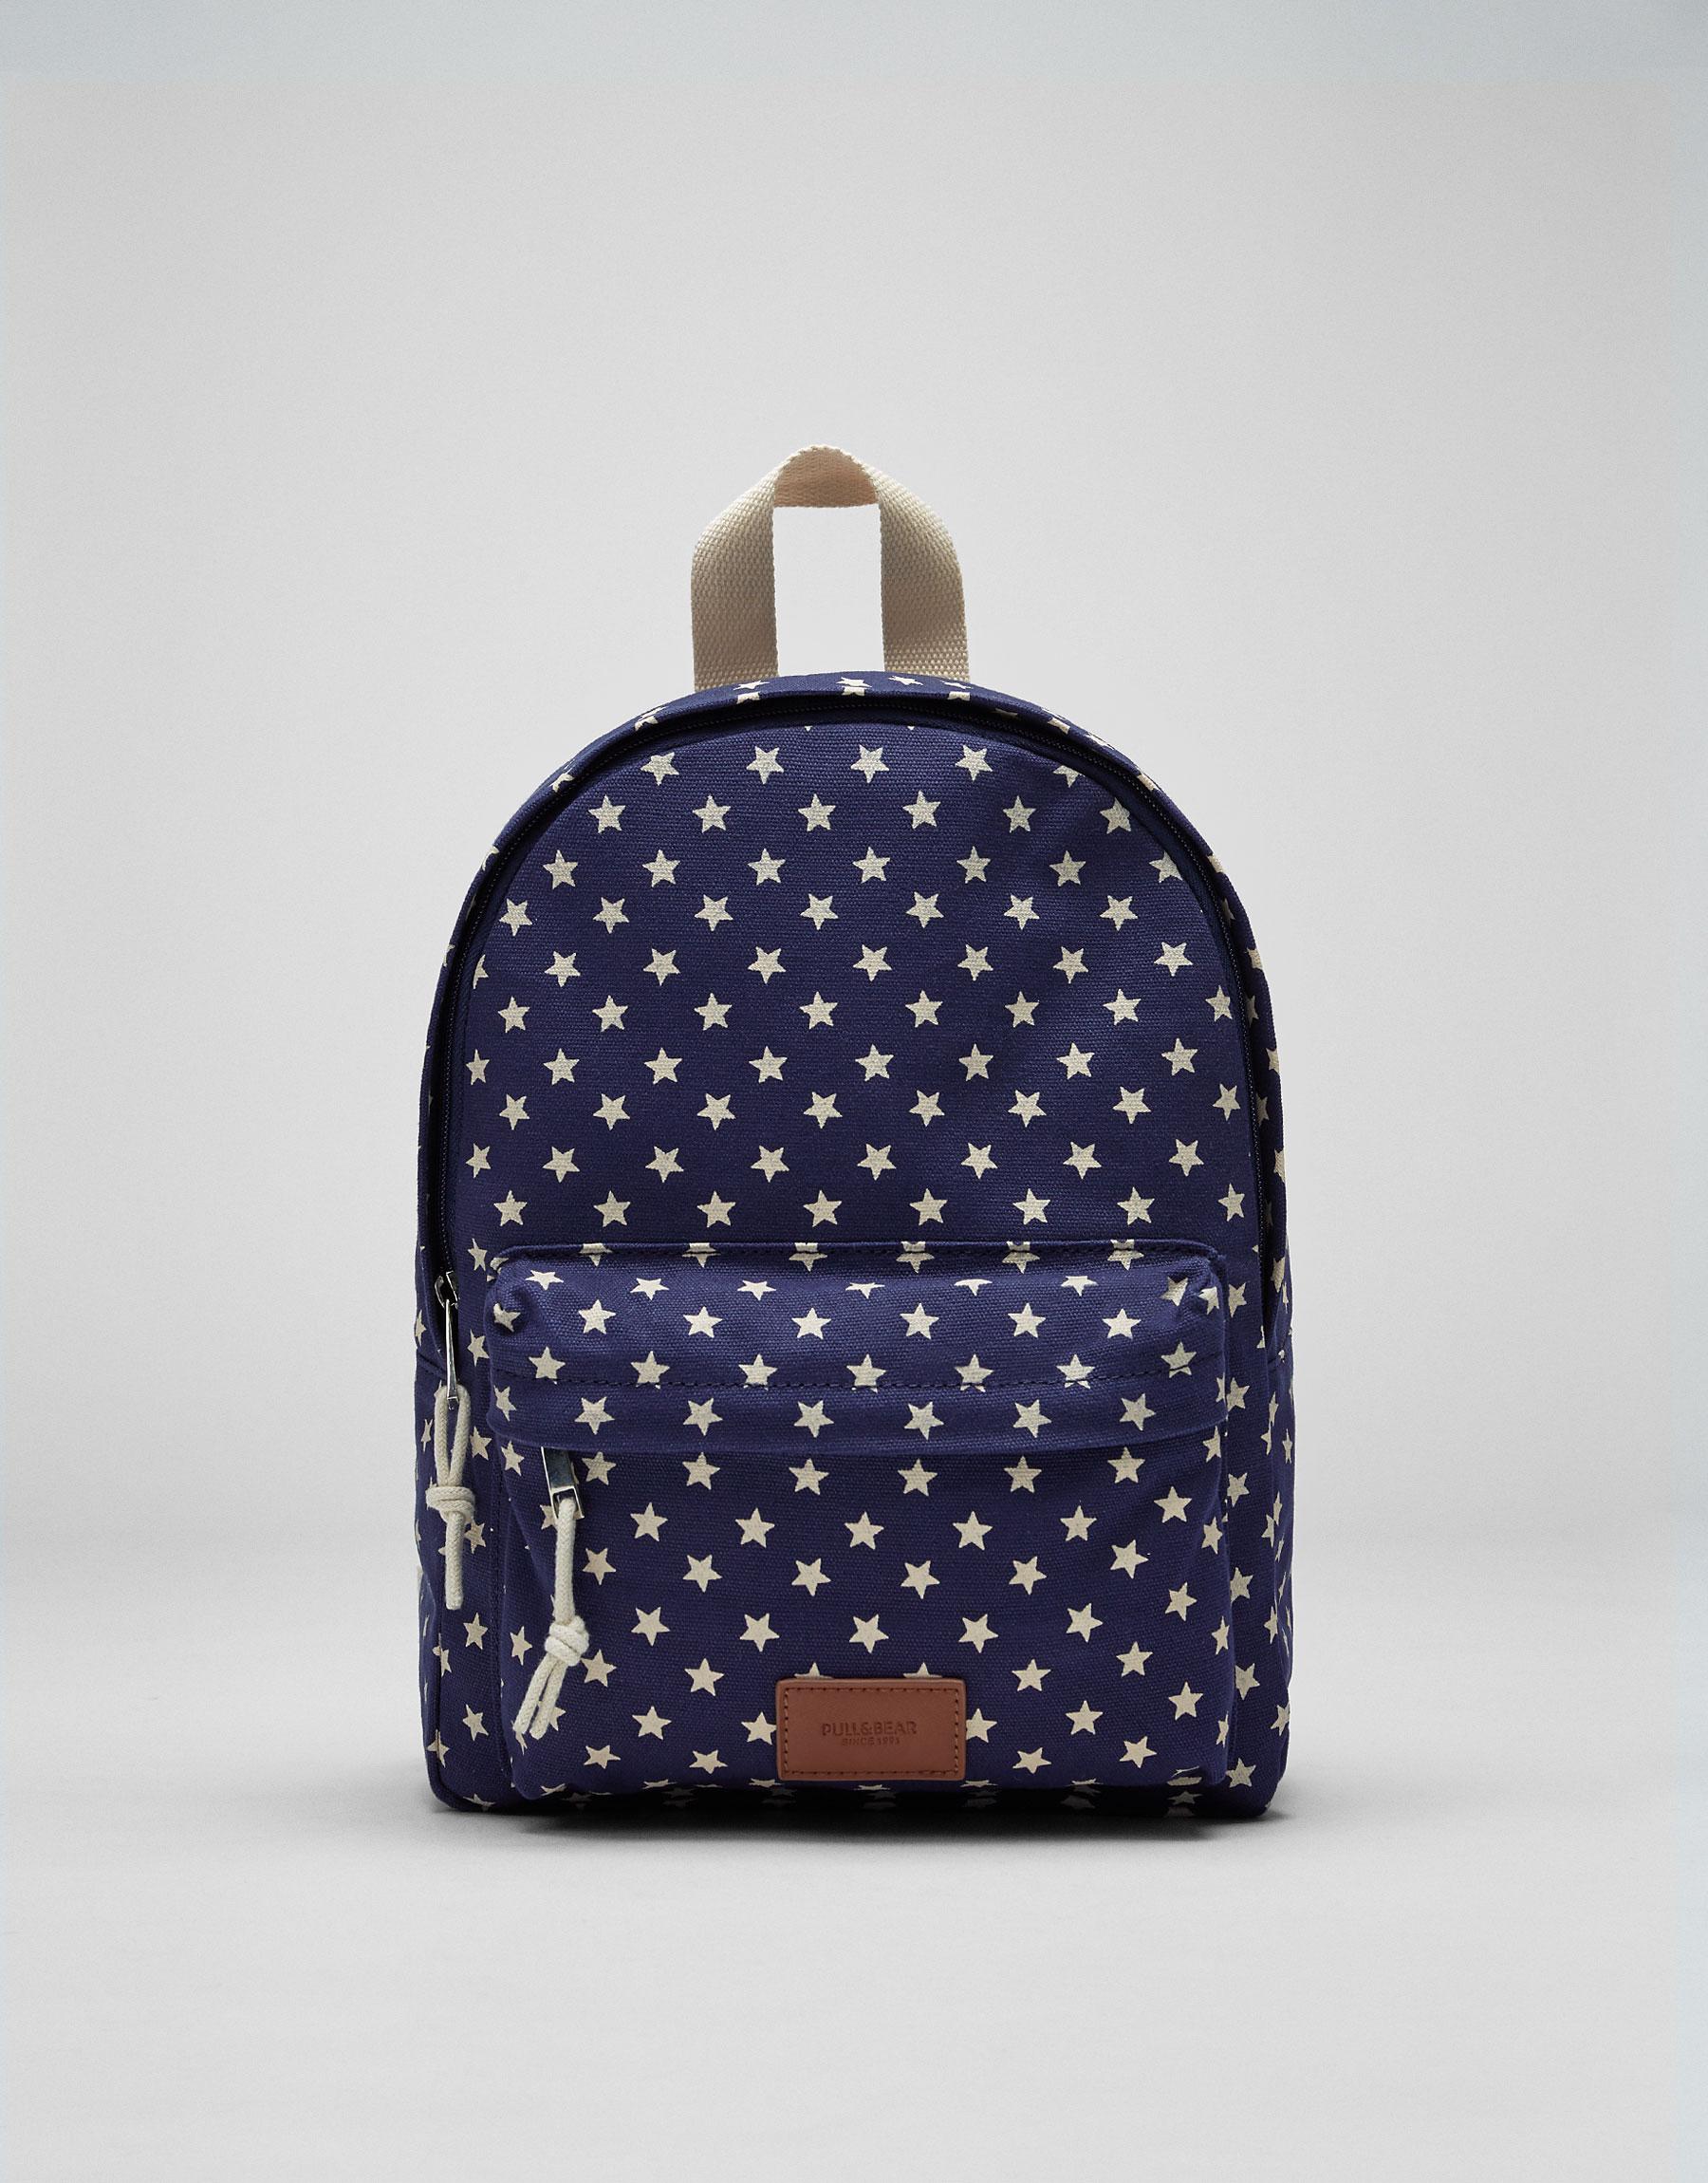 Mini mochila estrellas